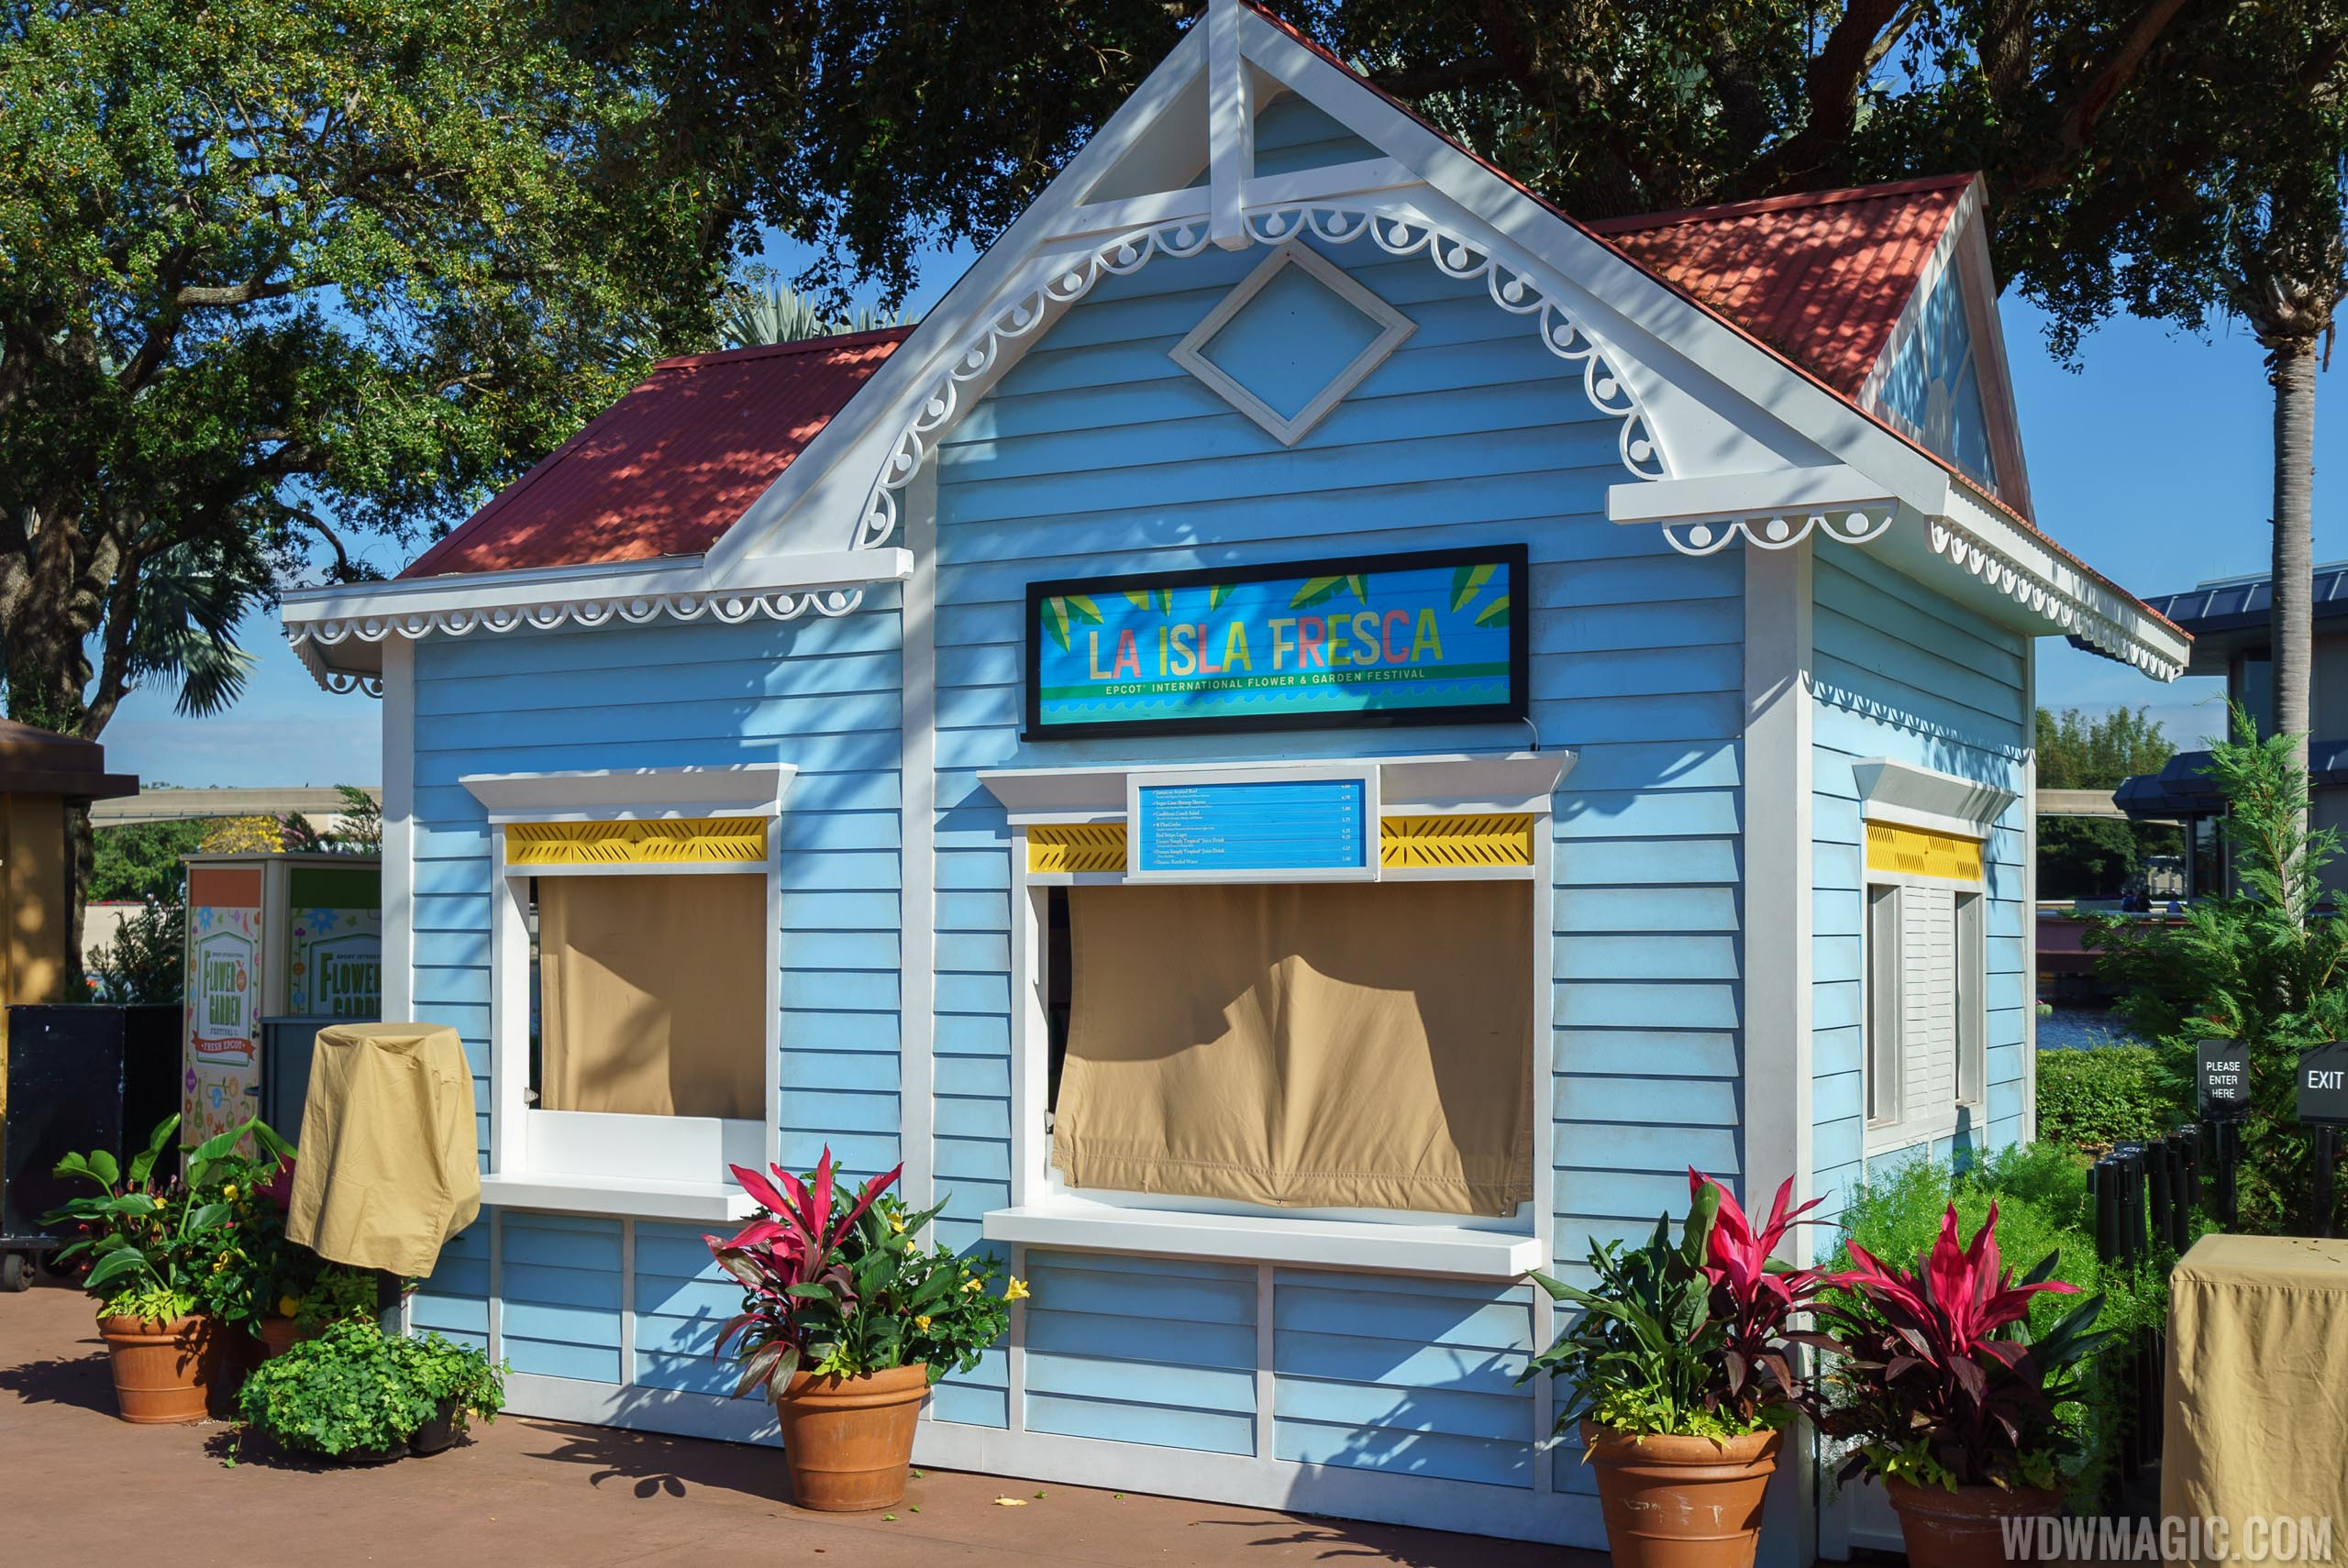 2017 Epcot Flower and Garden Festival Outdoor Kitchen kiosks and menus